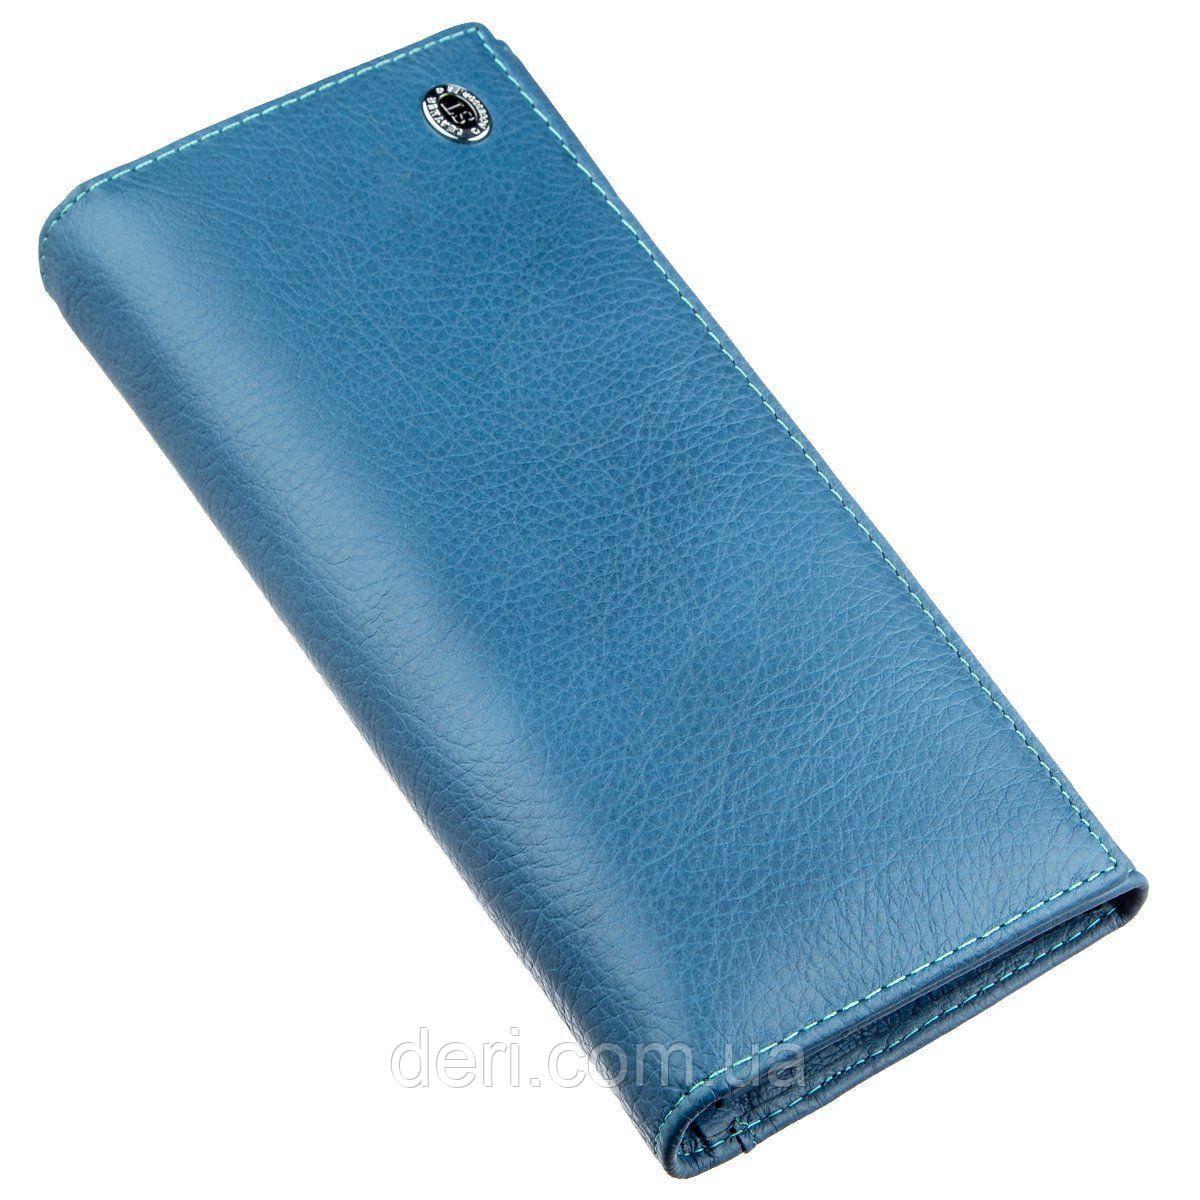 Практичный женский кошелек ST Leather 18899 Голубой, Голубой